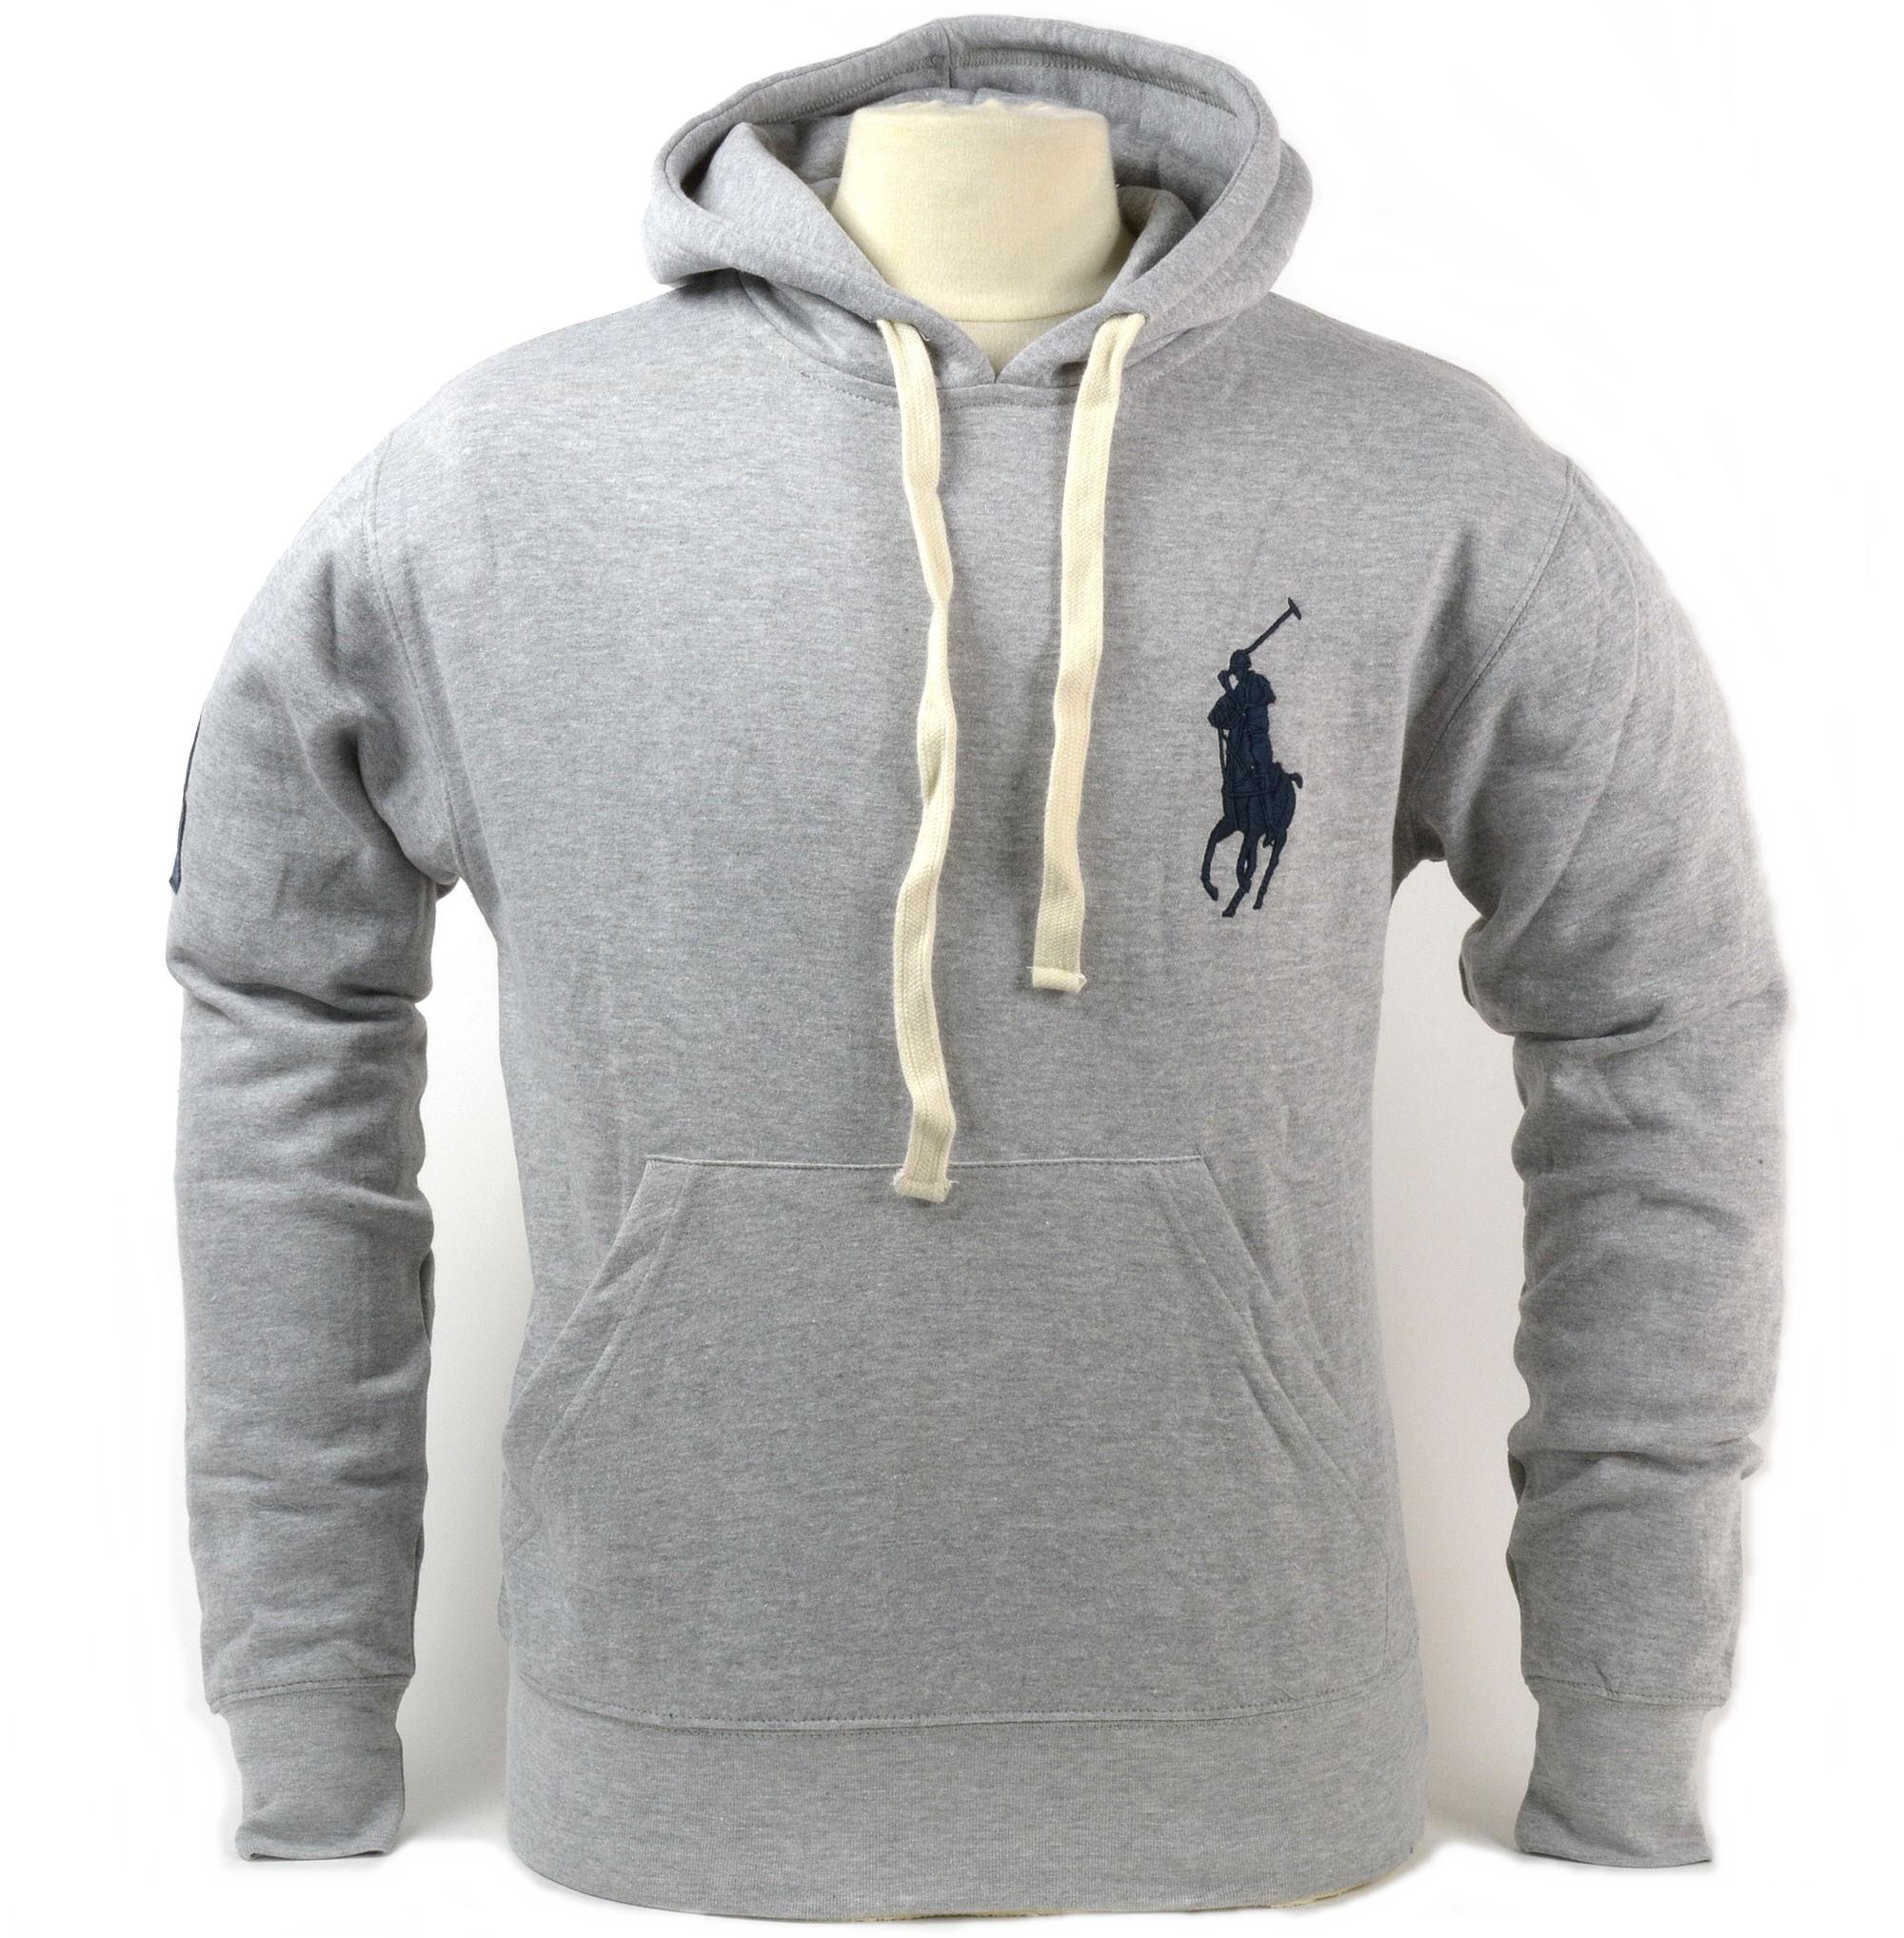 Big pony hoodie